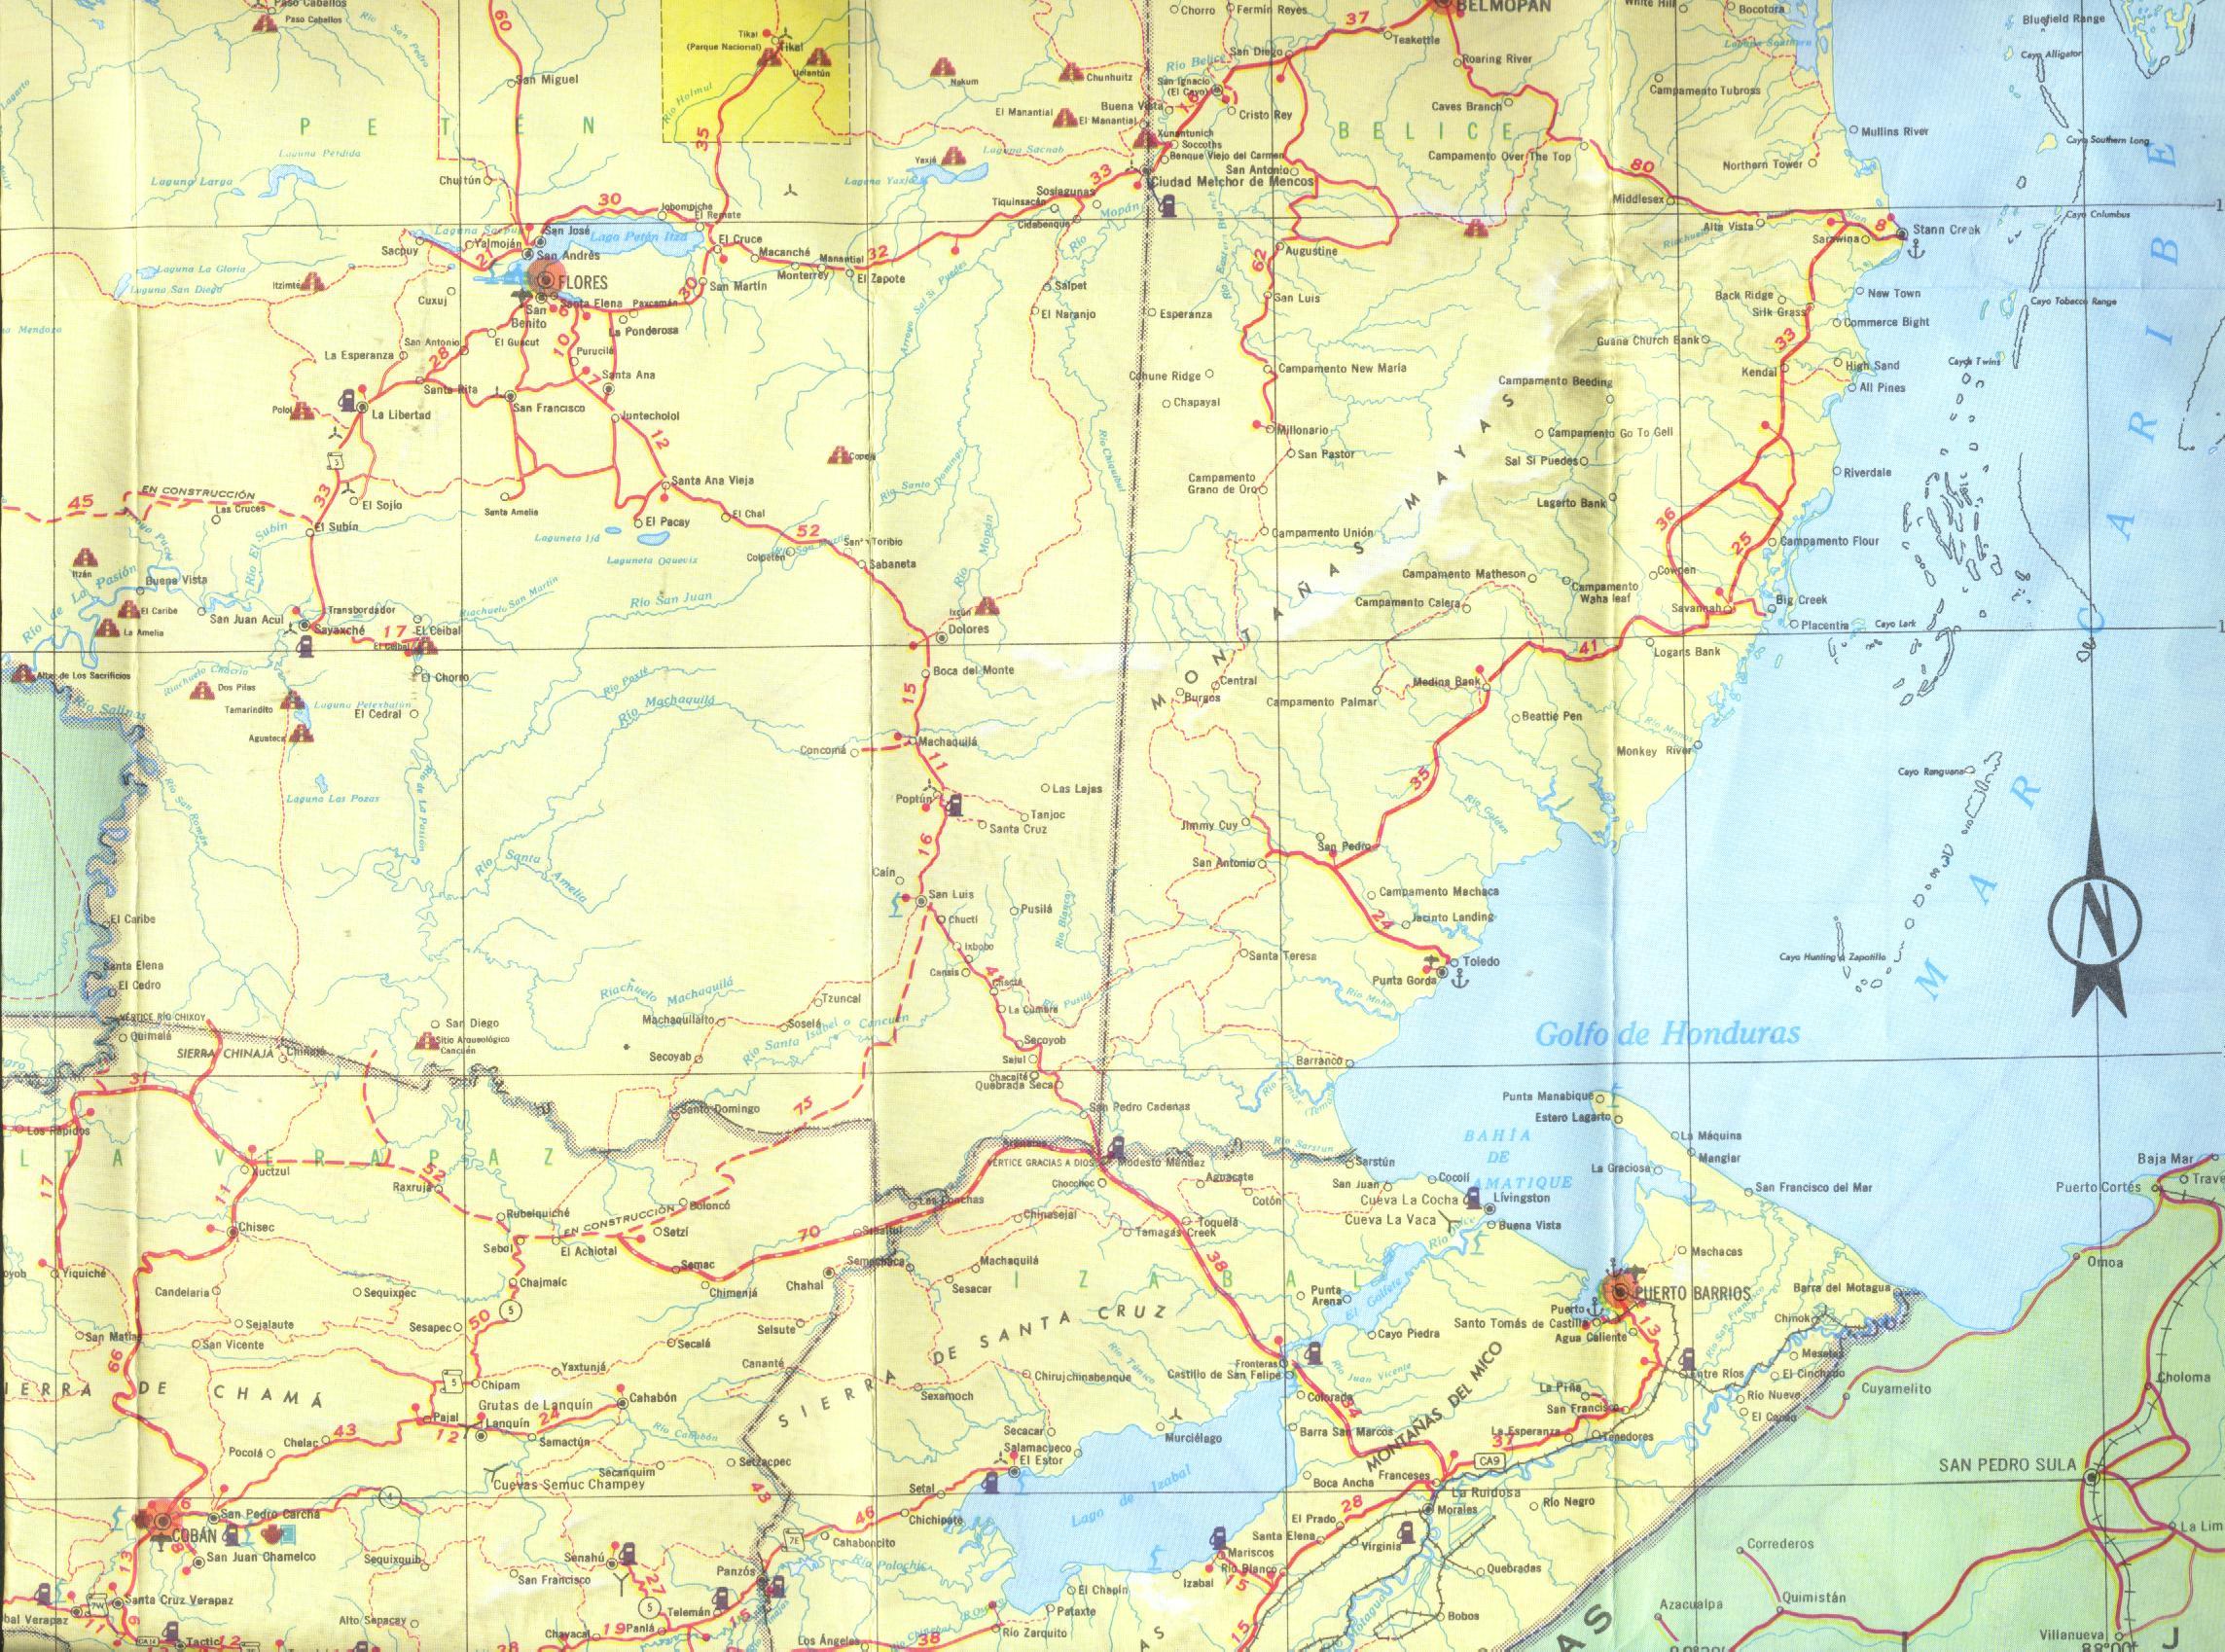 Mapa del Norte Central de Guatemala